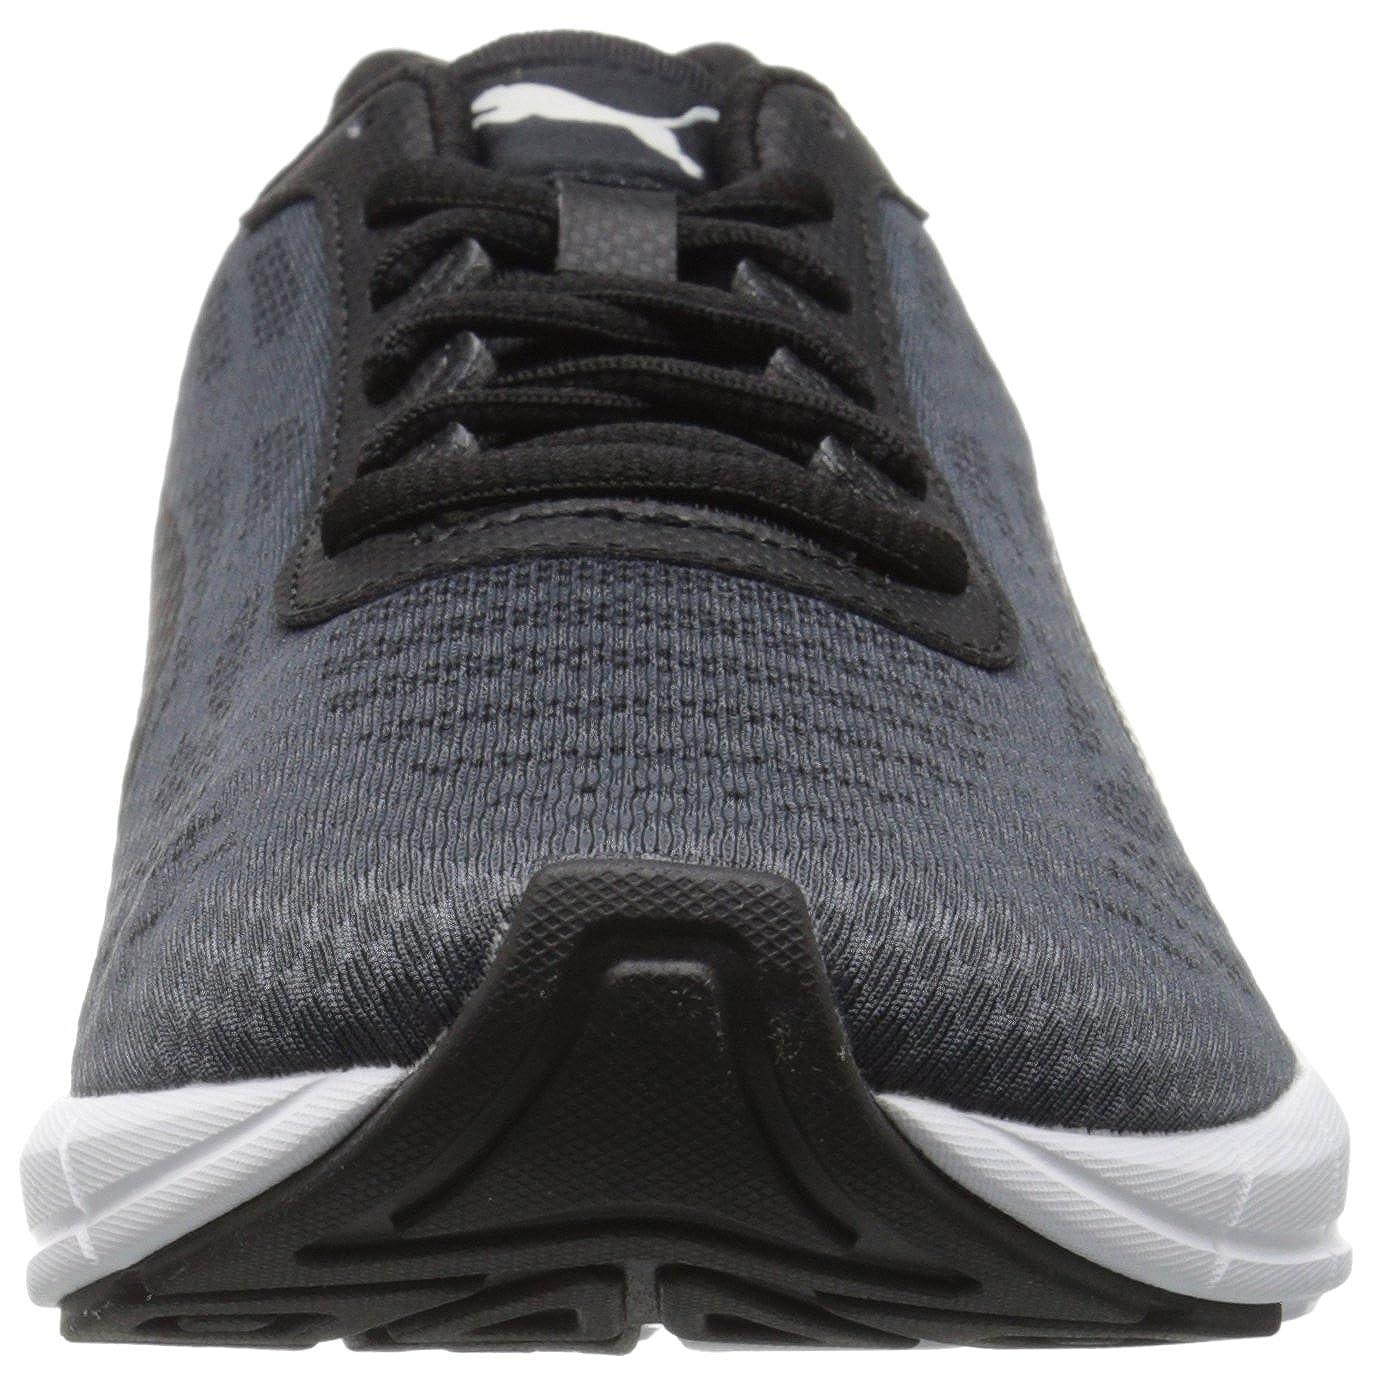 PUMA Men's Meteor Running Shoe, Asphalt BlackPatent, 13 M